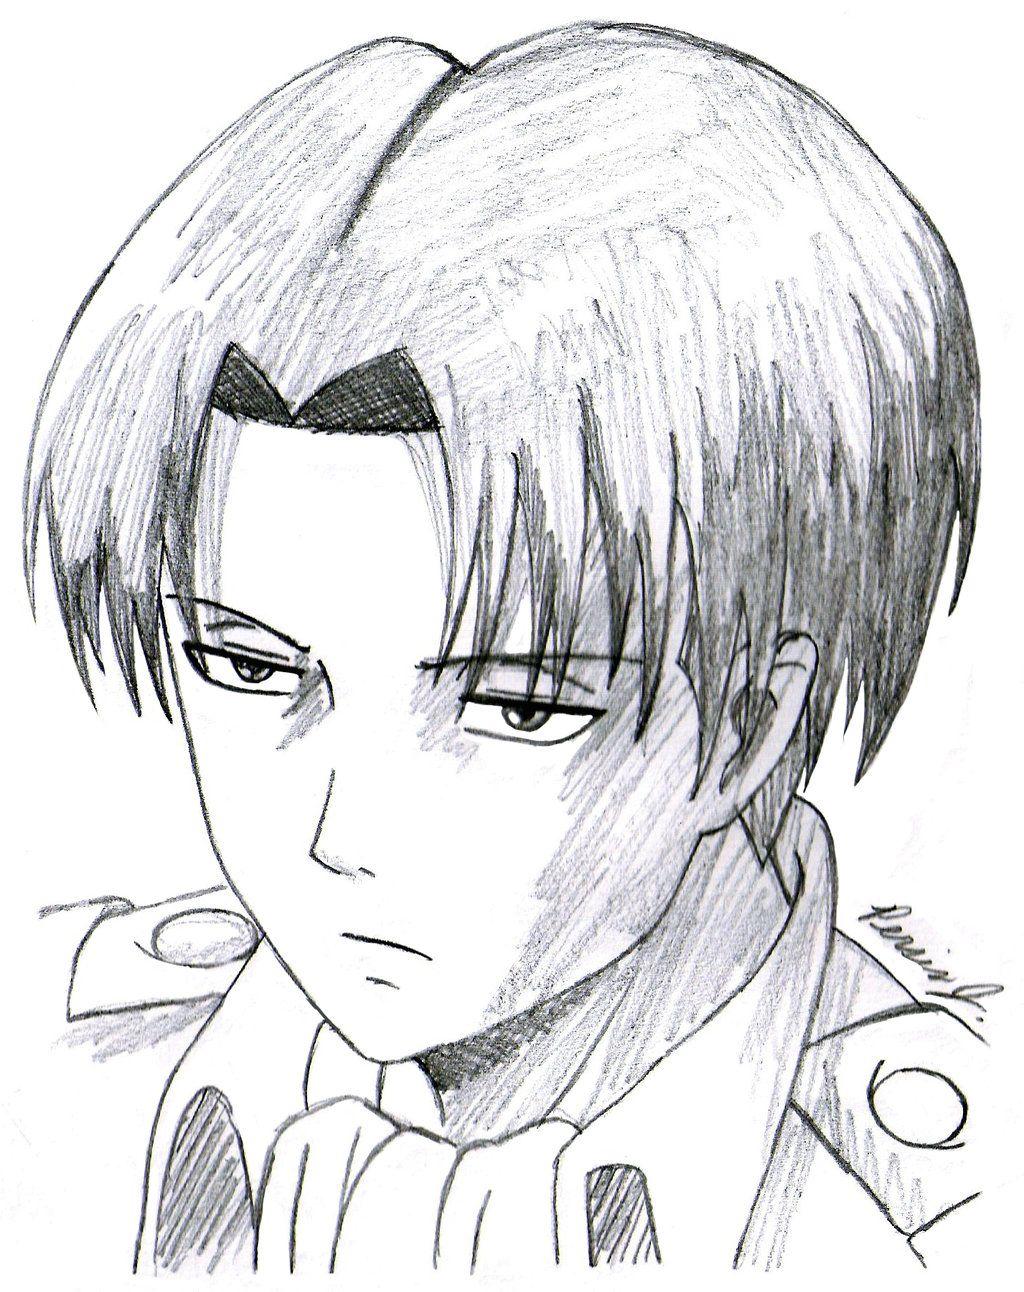 Levi Ackerman Sketch By Pdj004 On Deviantart Easy Drawings Sketches Anime Drawings Sketches Anime Drawing Styles